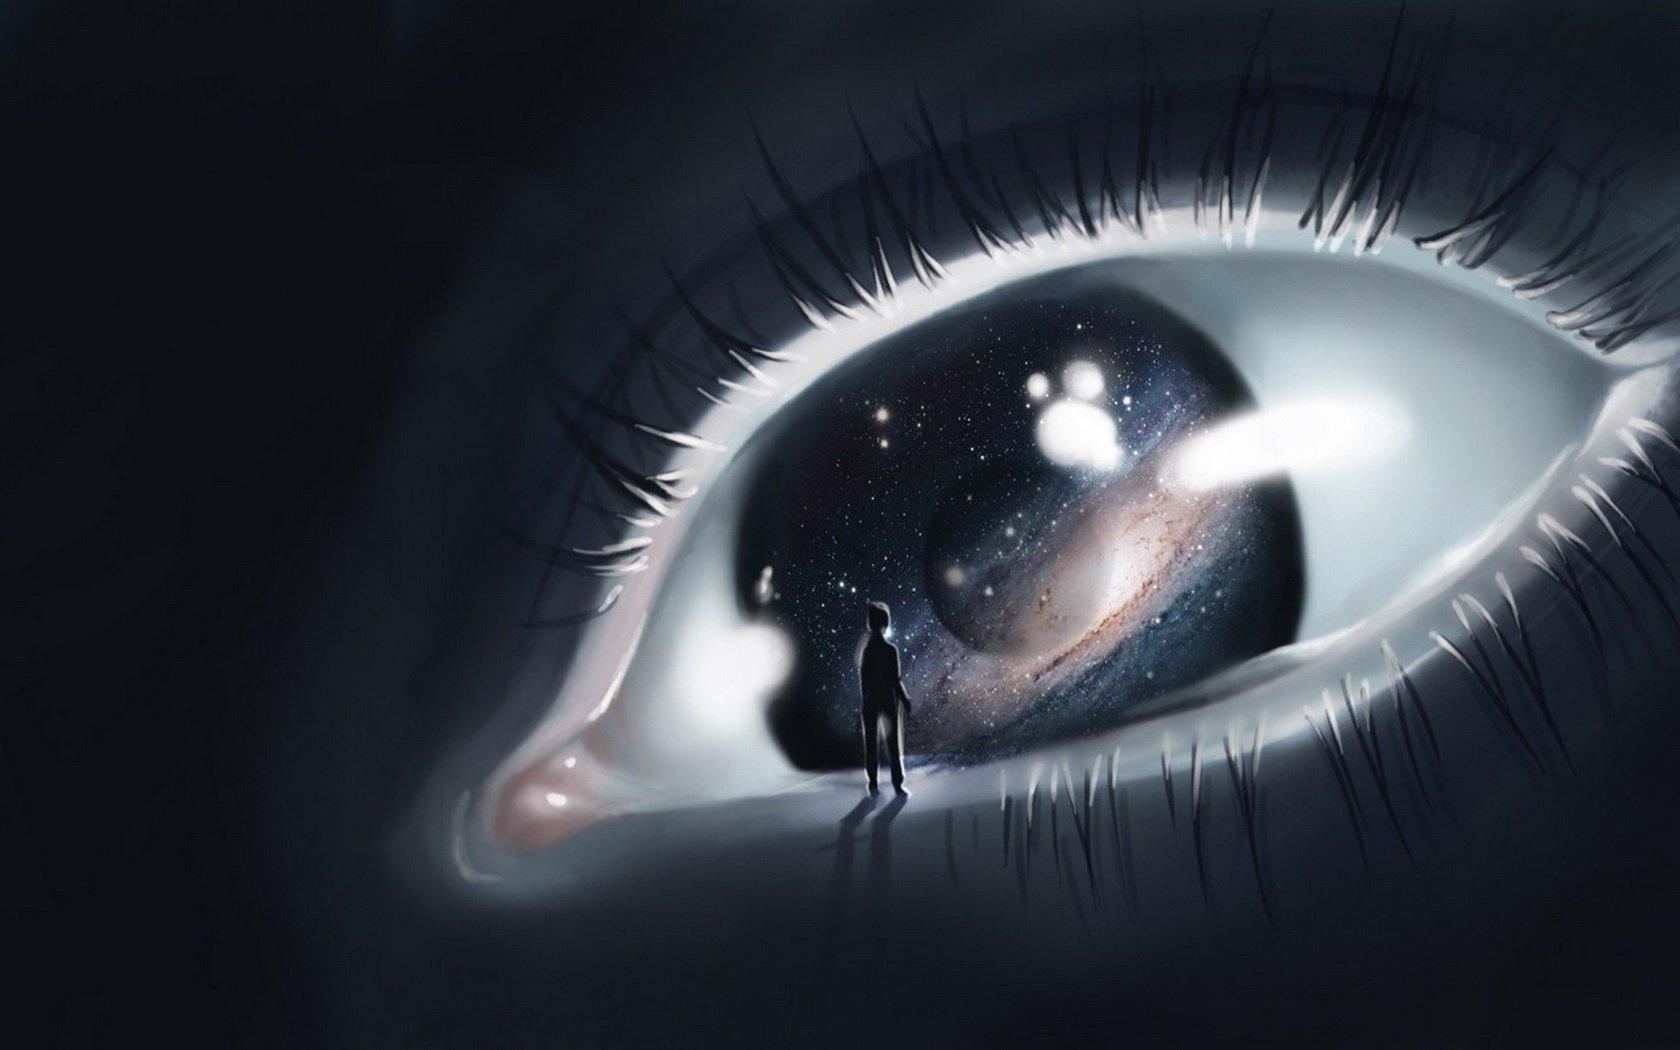 Background Artistic Eye Wallpaper